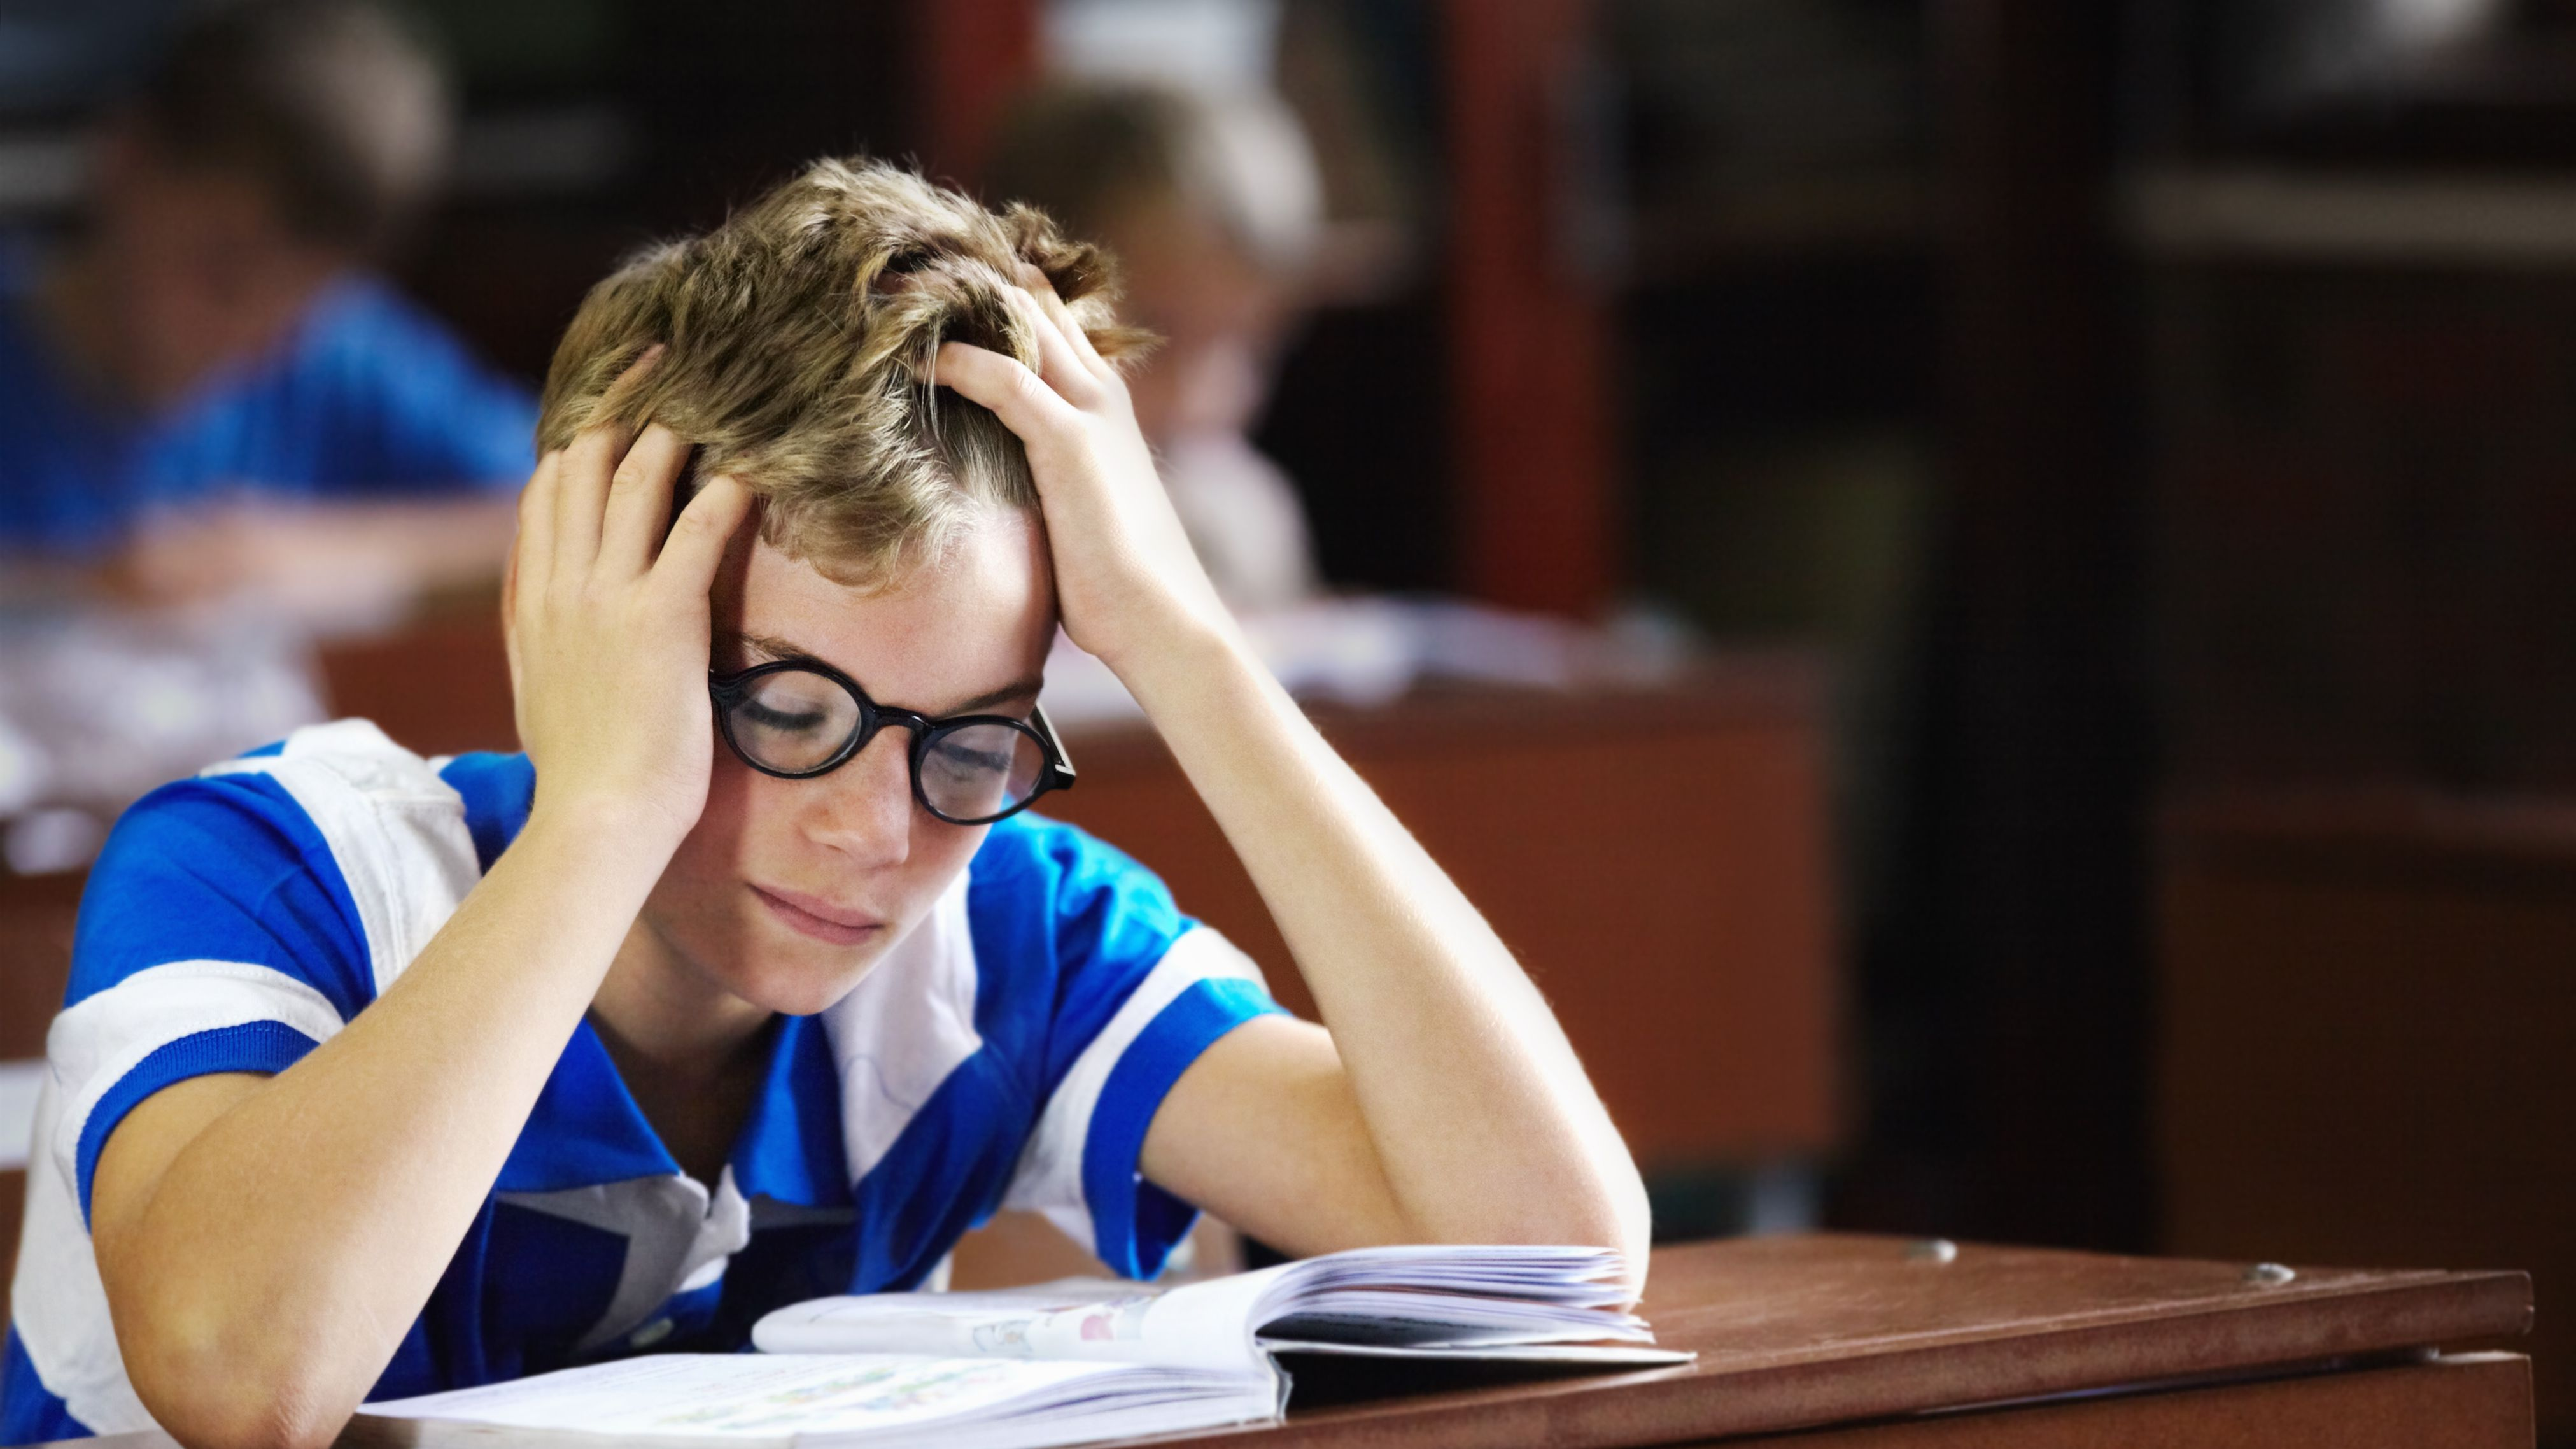 Listening Comprehension Passages For Grade 10